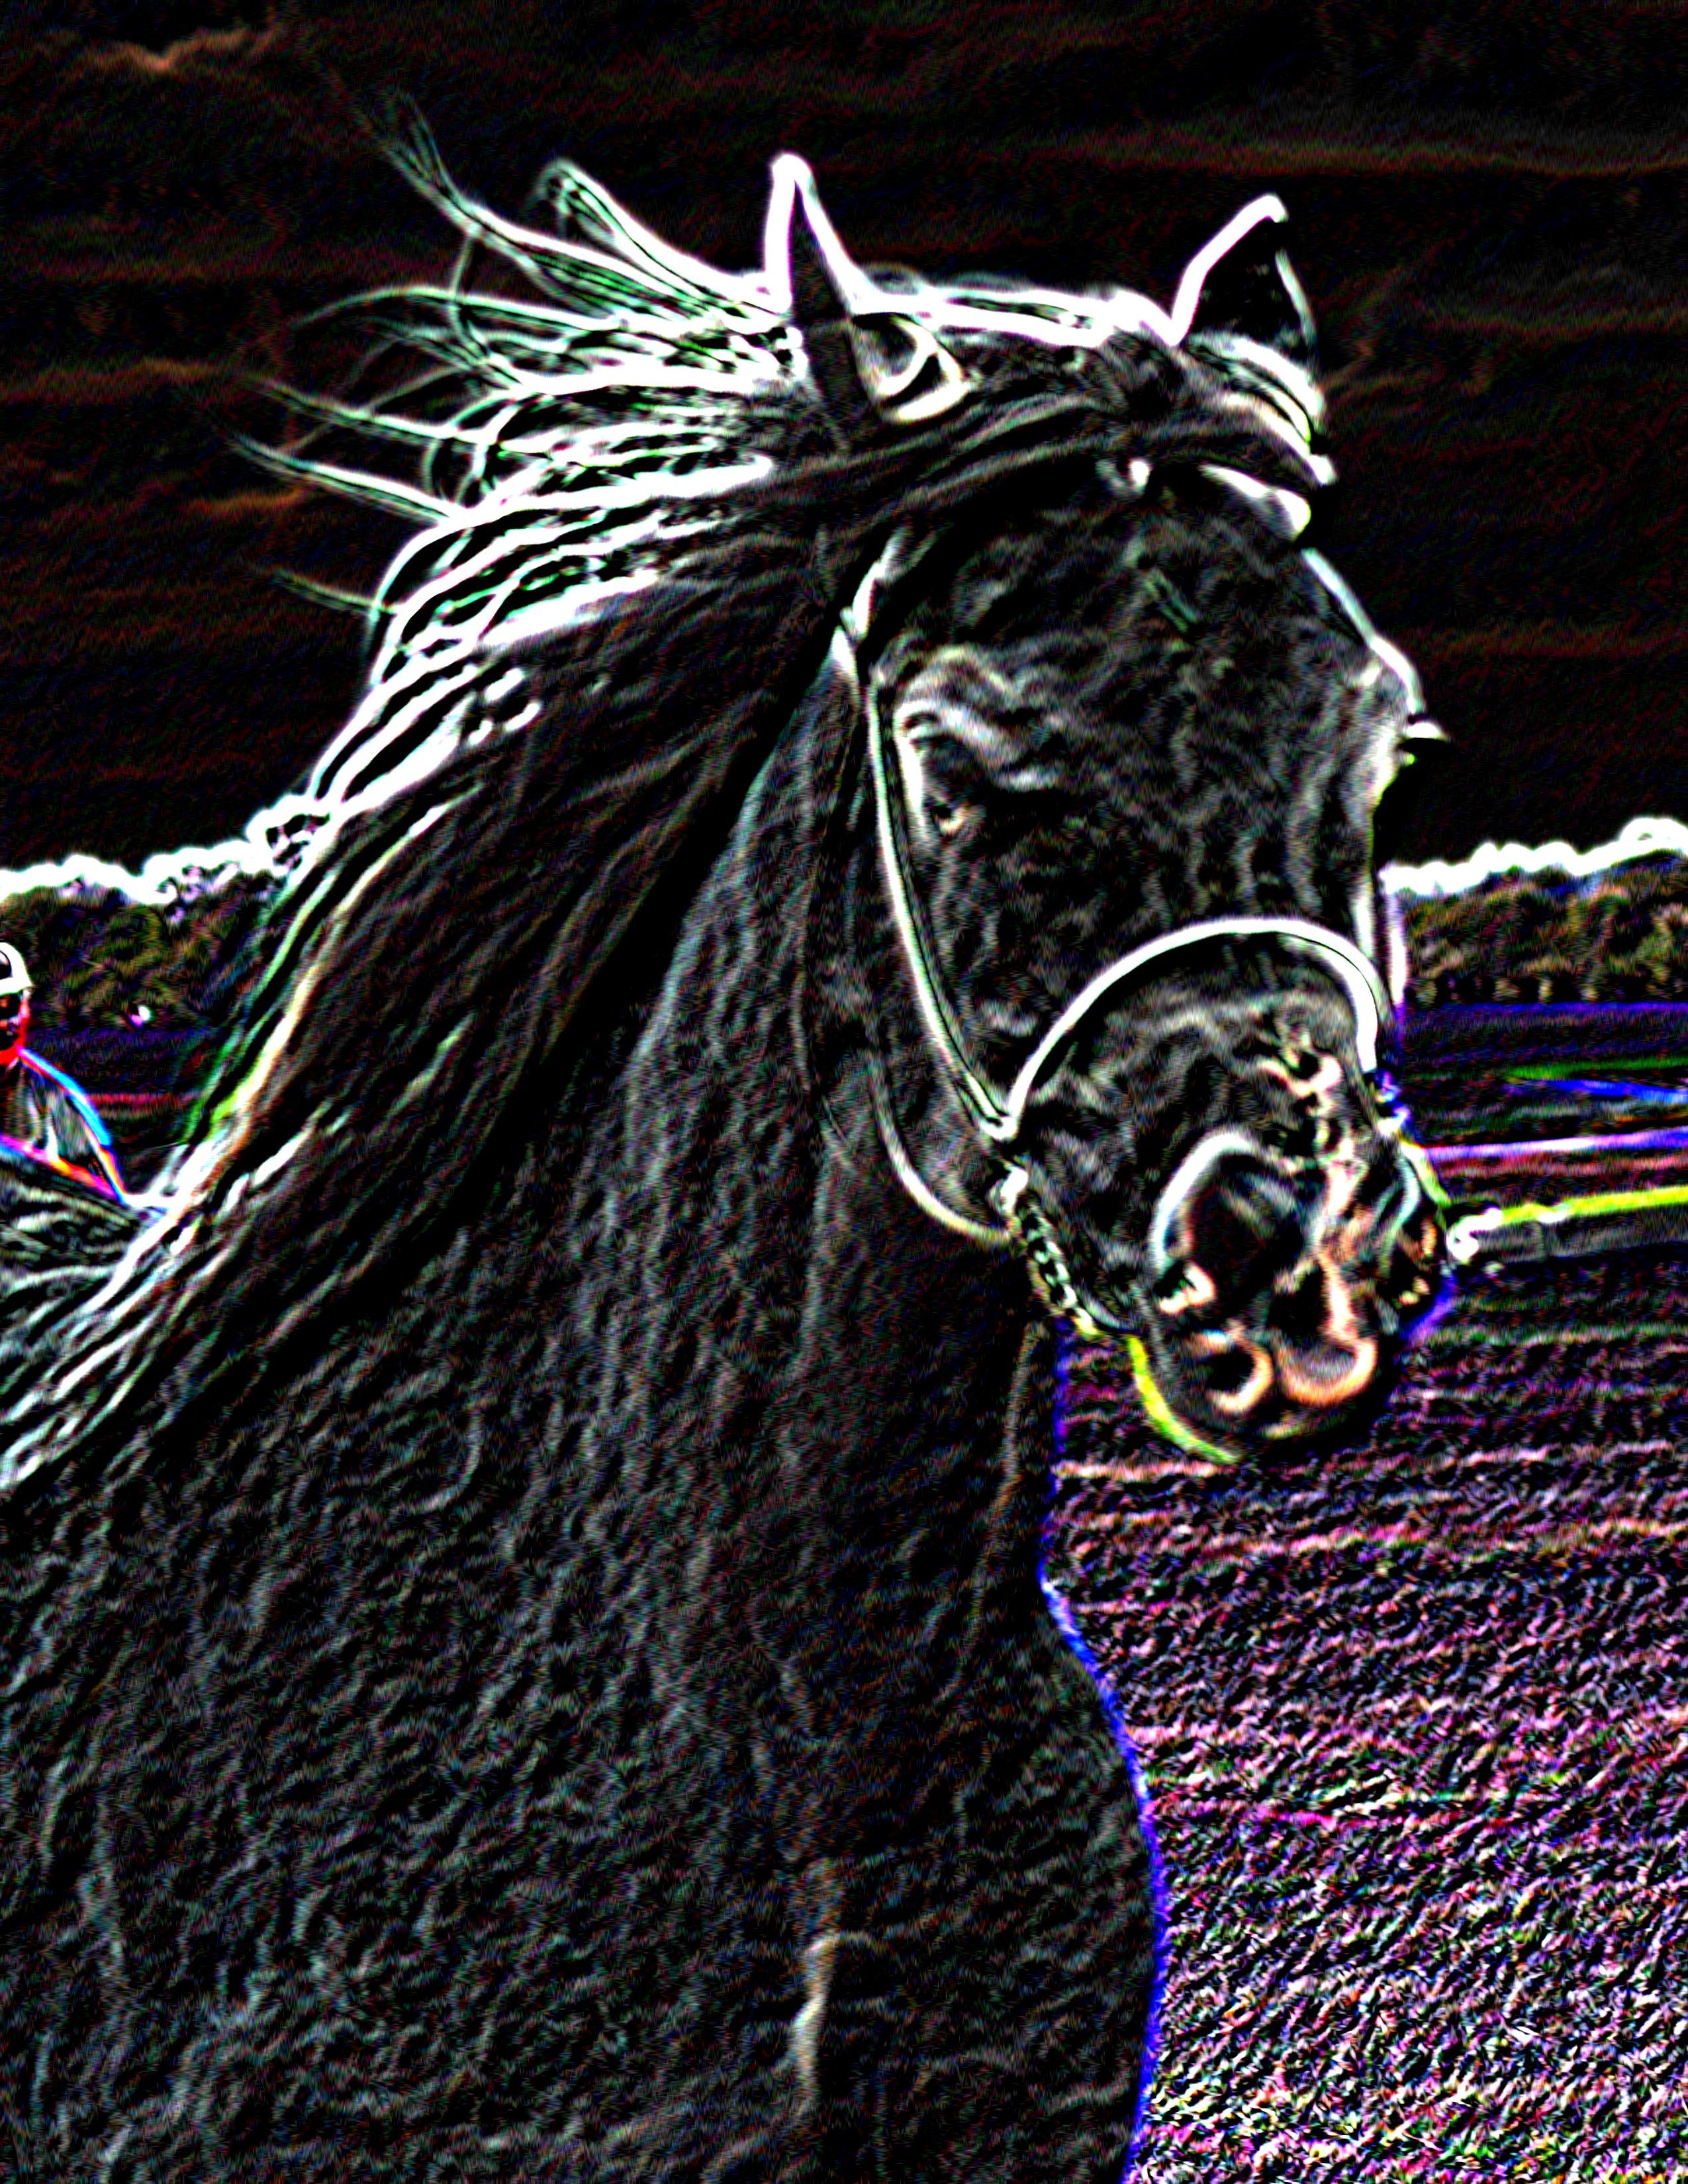 Neon Horse Photo 8.5x11 FINAL